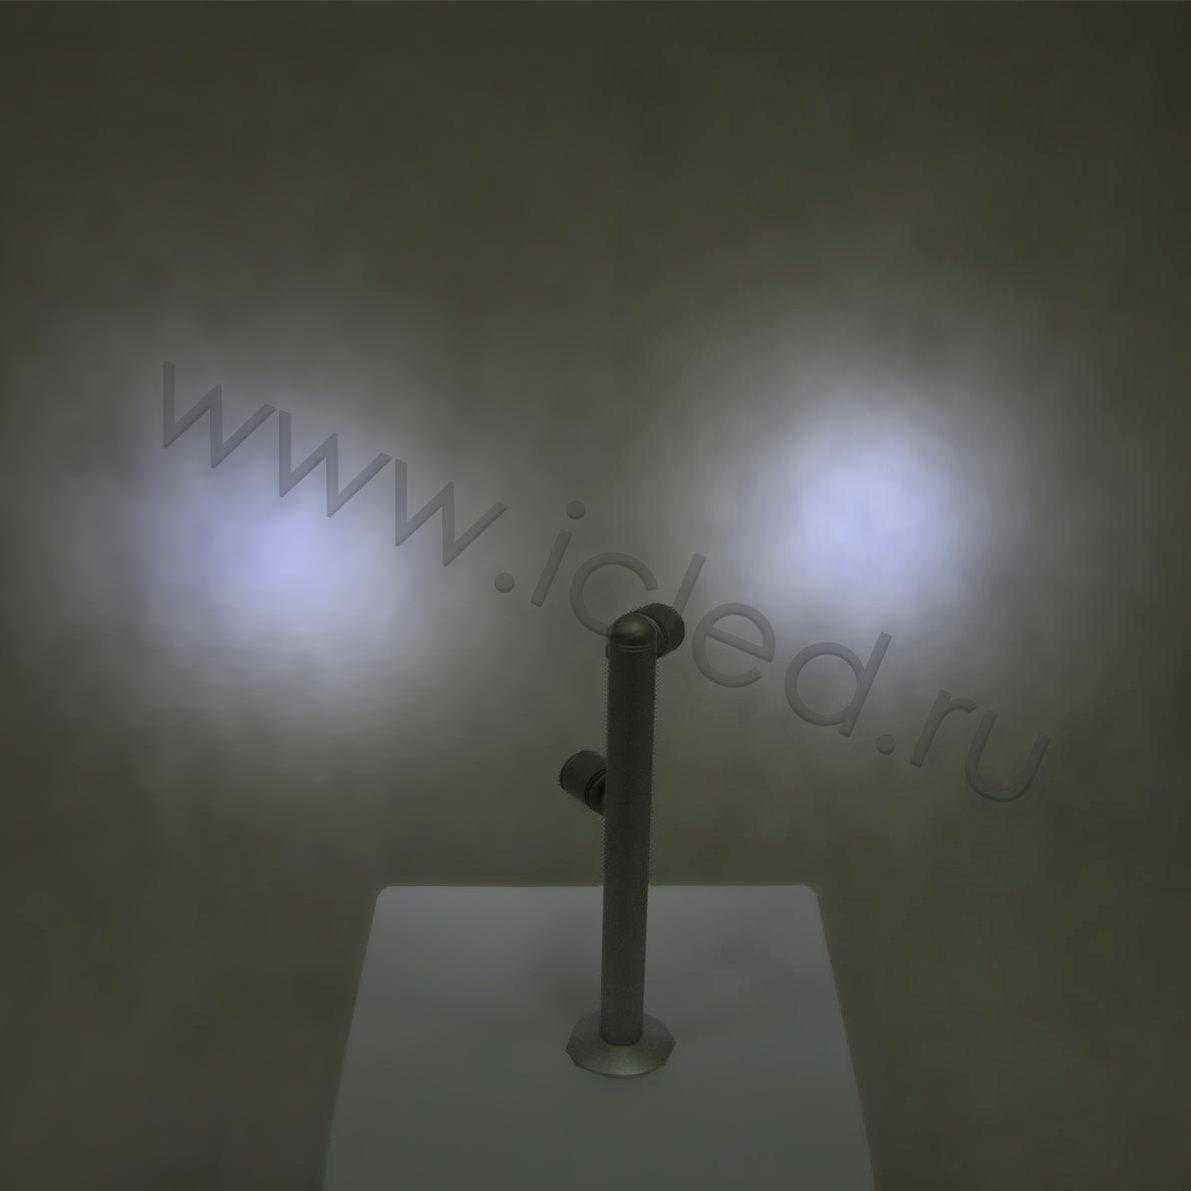 Светильник для подсветки витрин 2W 220V 5000K